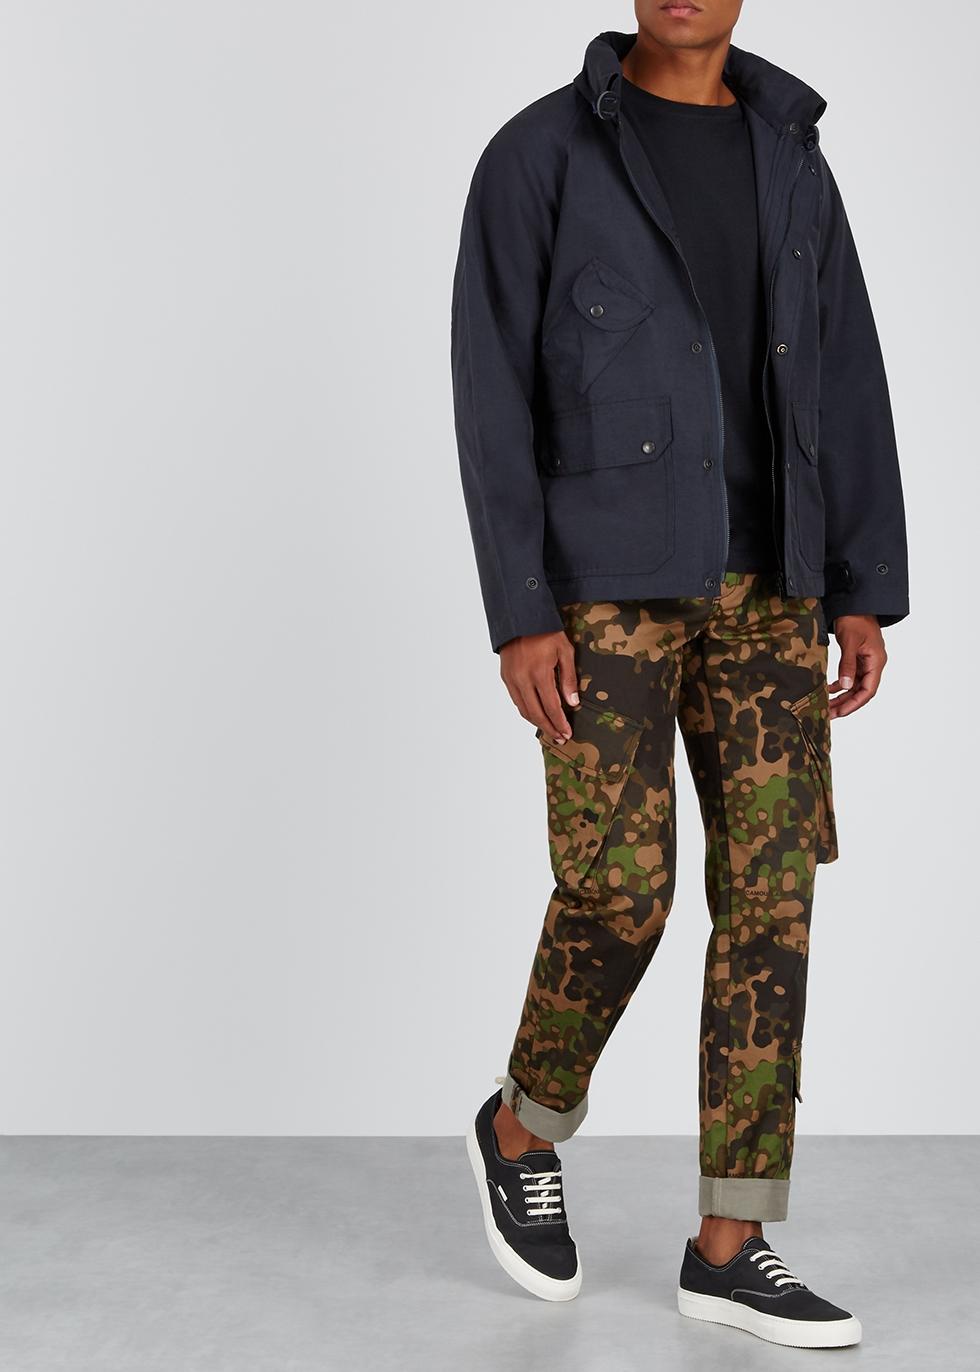 Carmel navy cotton-blend twill jacket - South2 West8